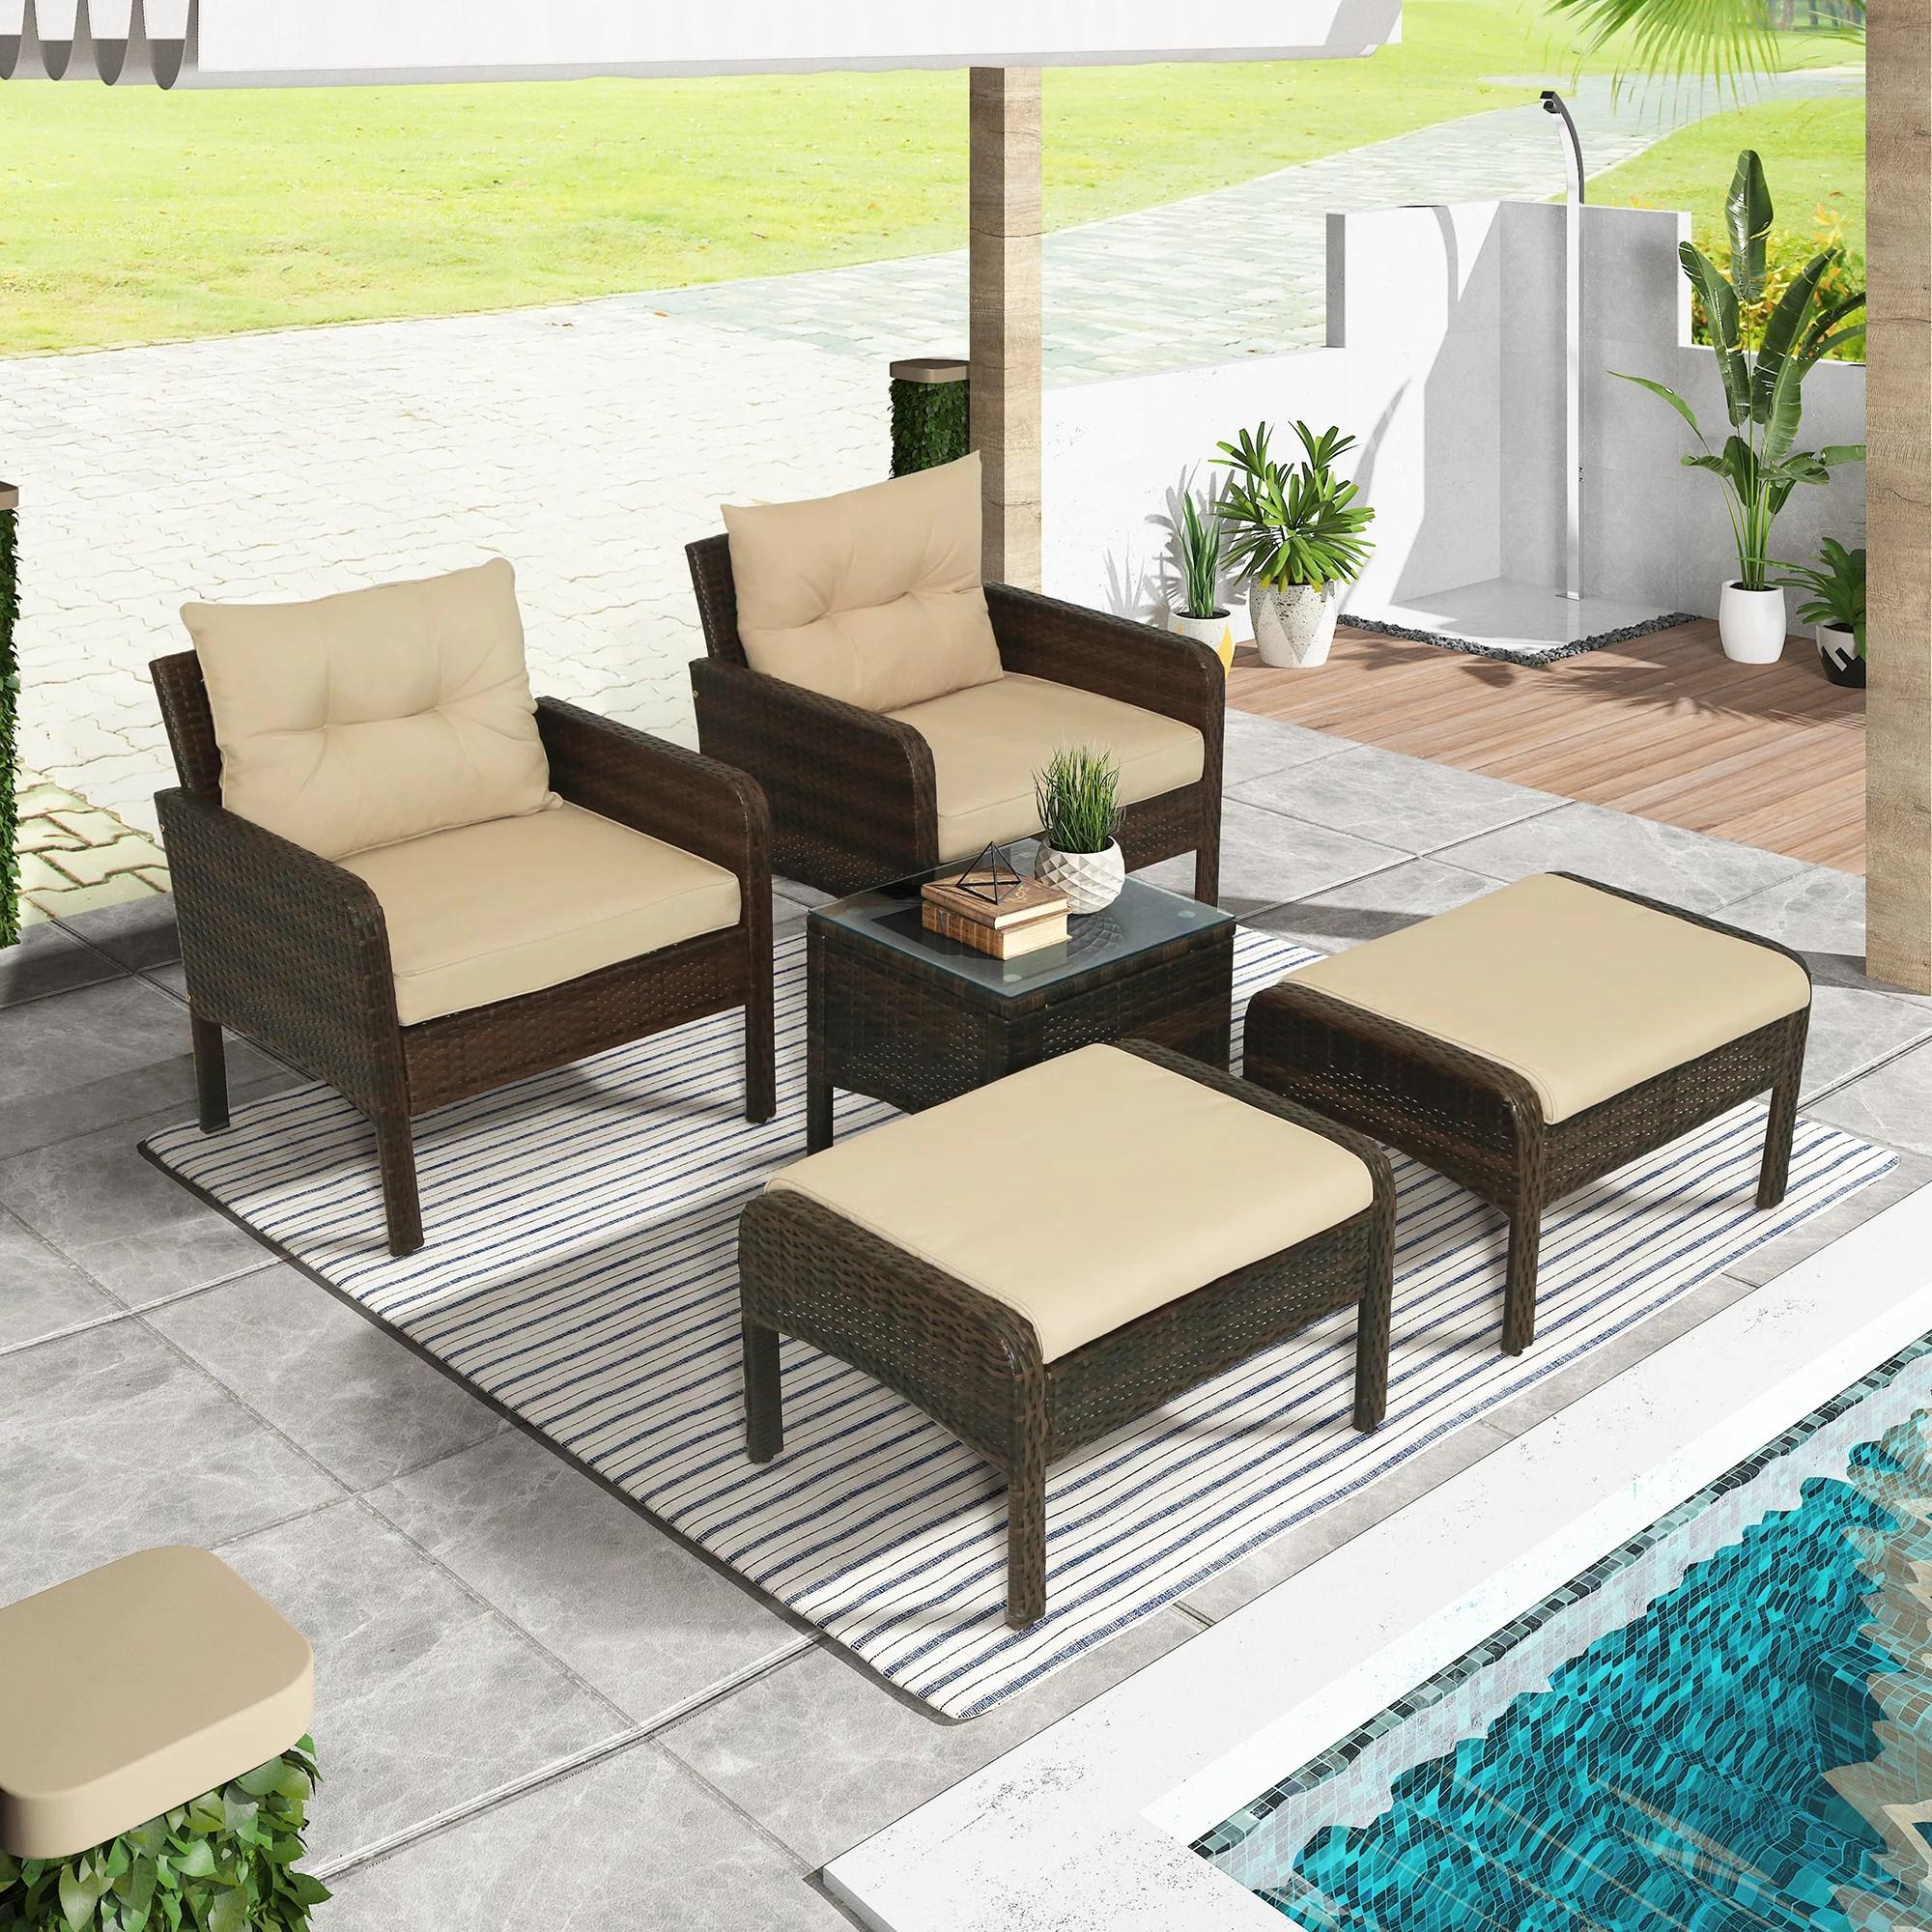 5 piece outdoor patio chairs set btmway pe rattan patio conversation sofa set for porch deck balcony lawn outdoor wicker bistro furniture ottoman